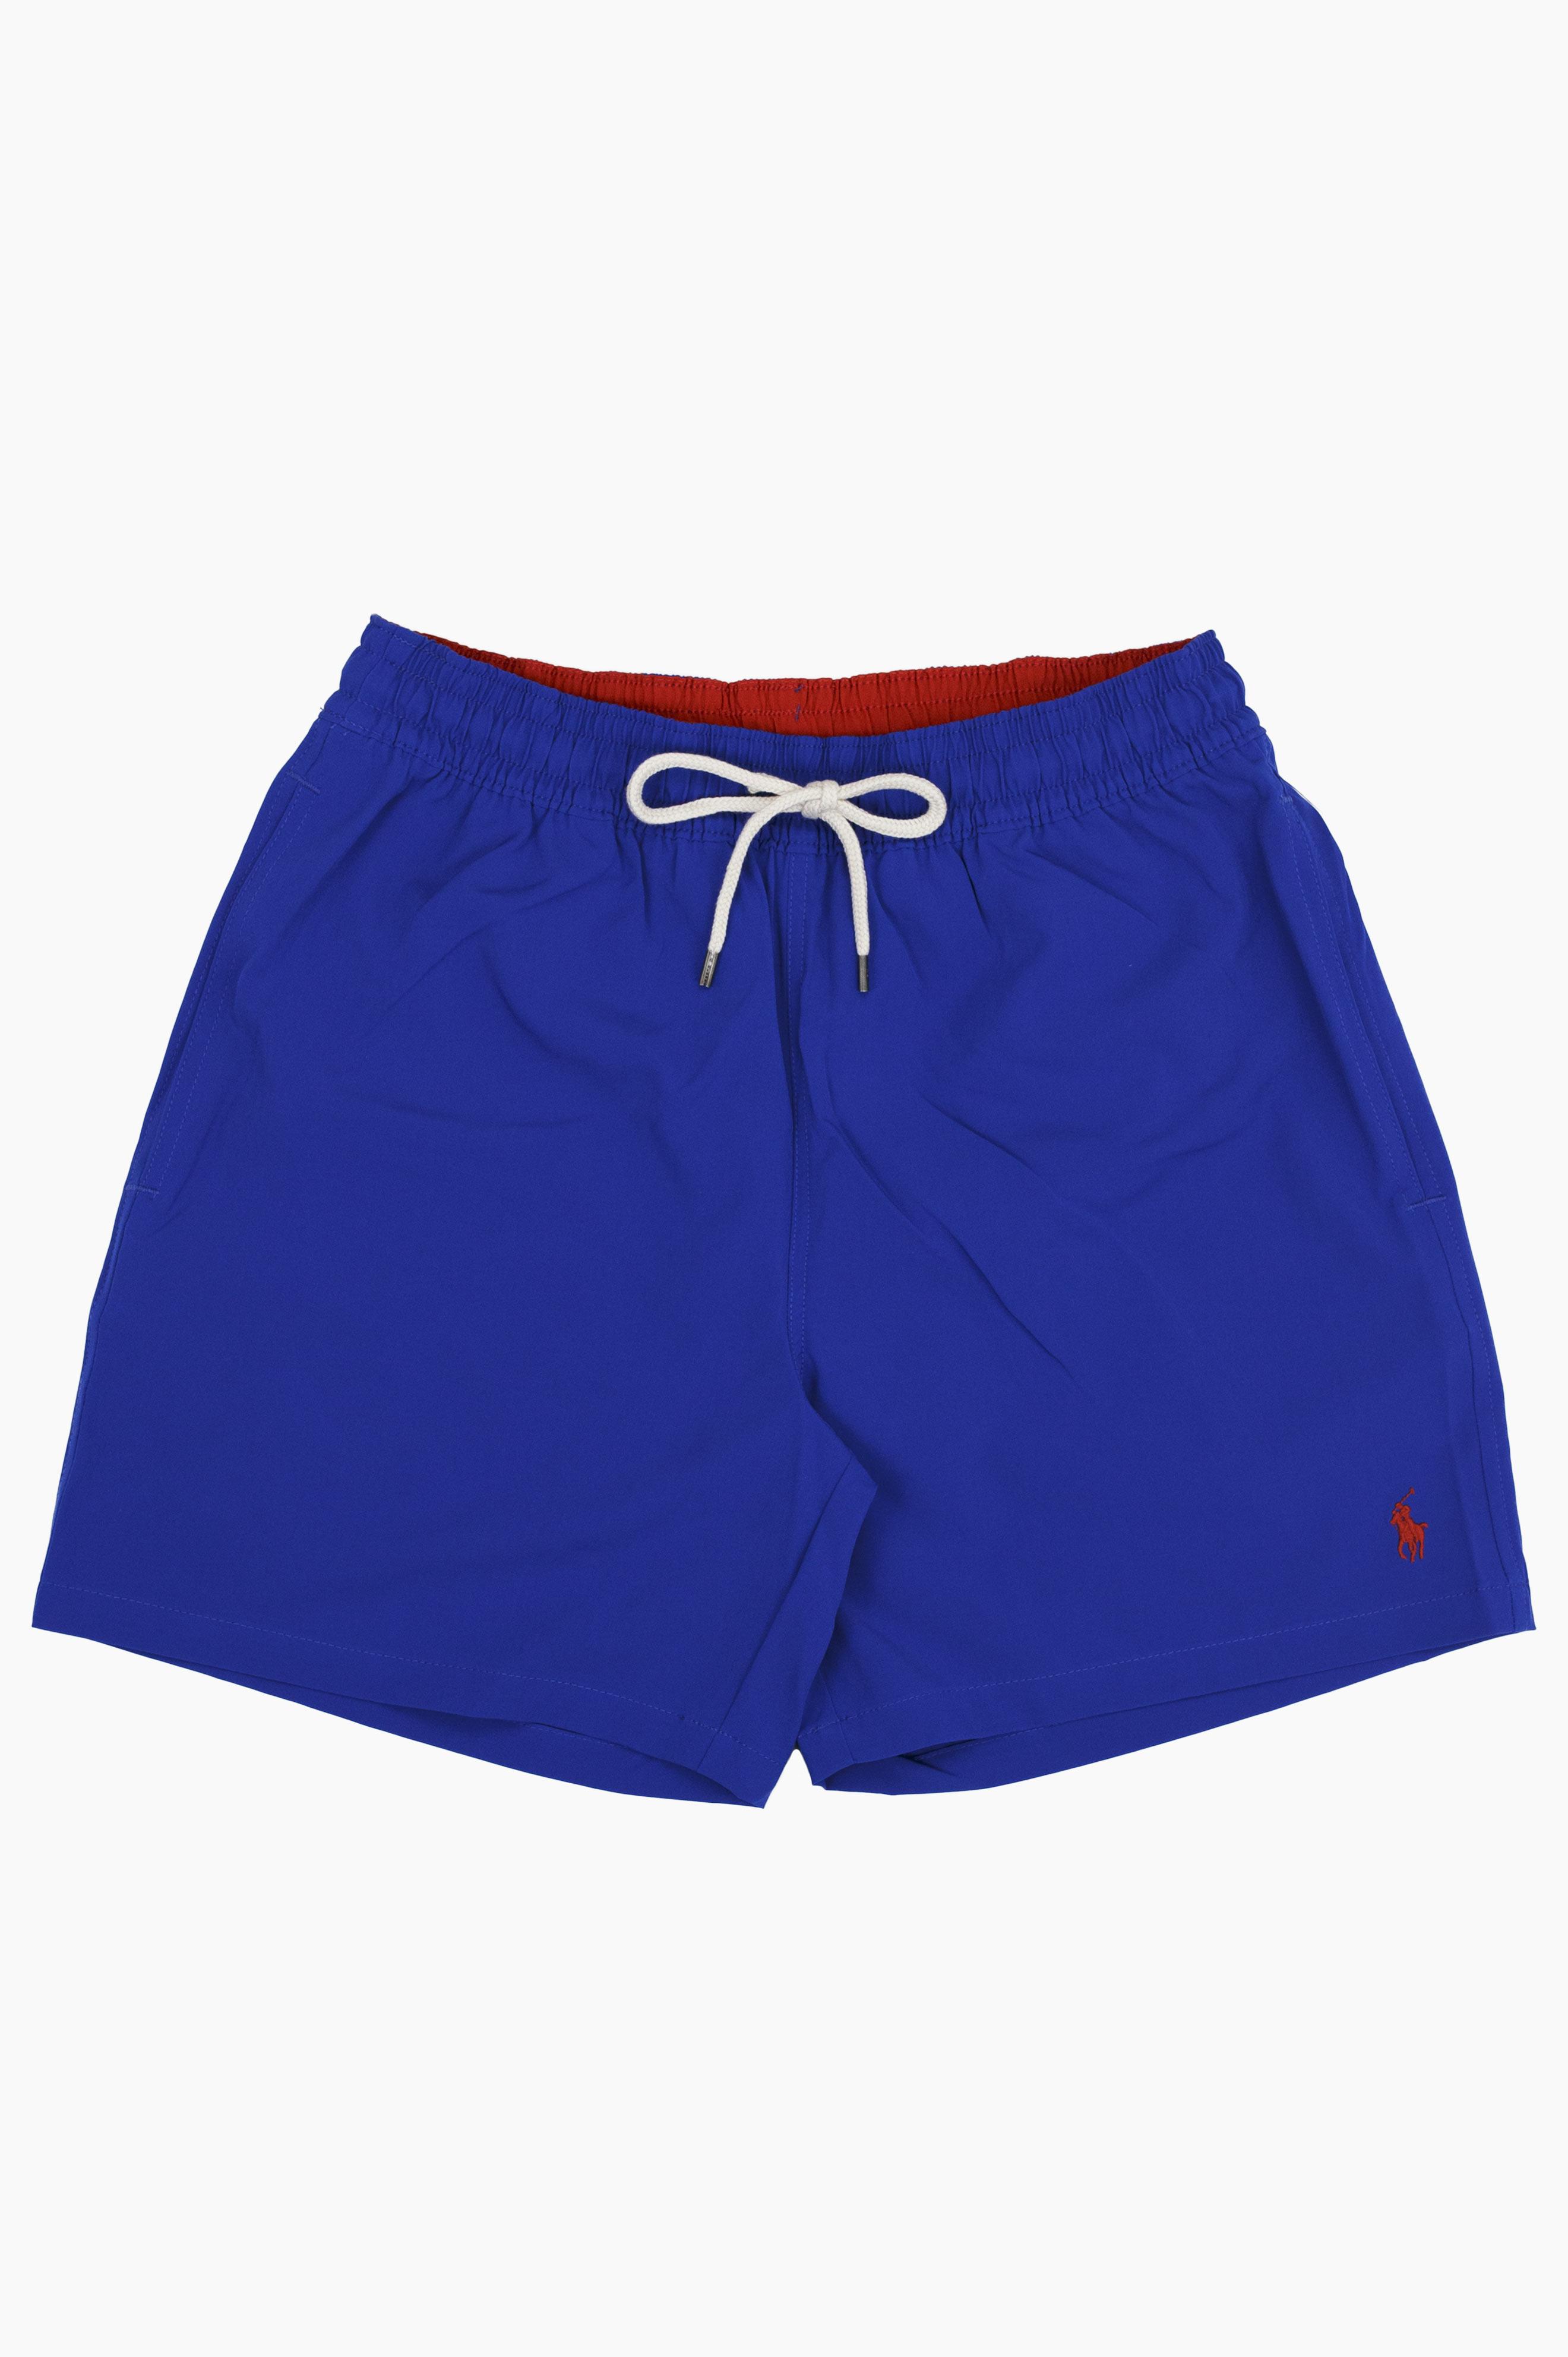 Traveler Swim Shorts Blue